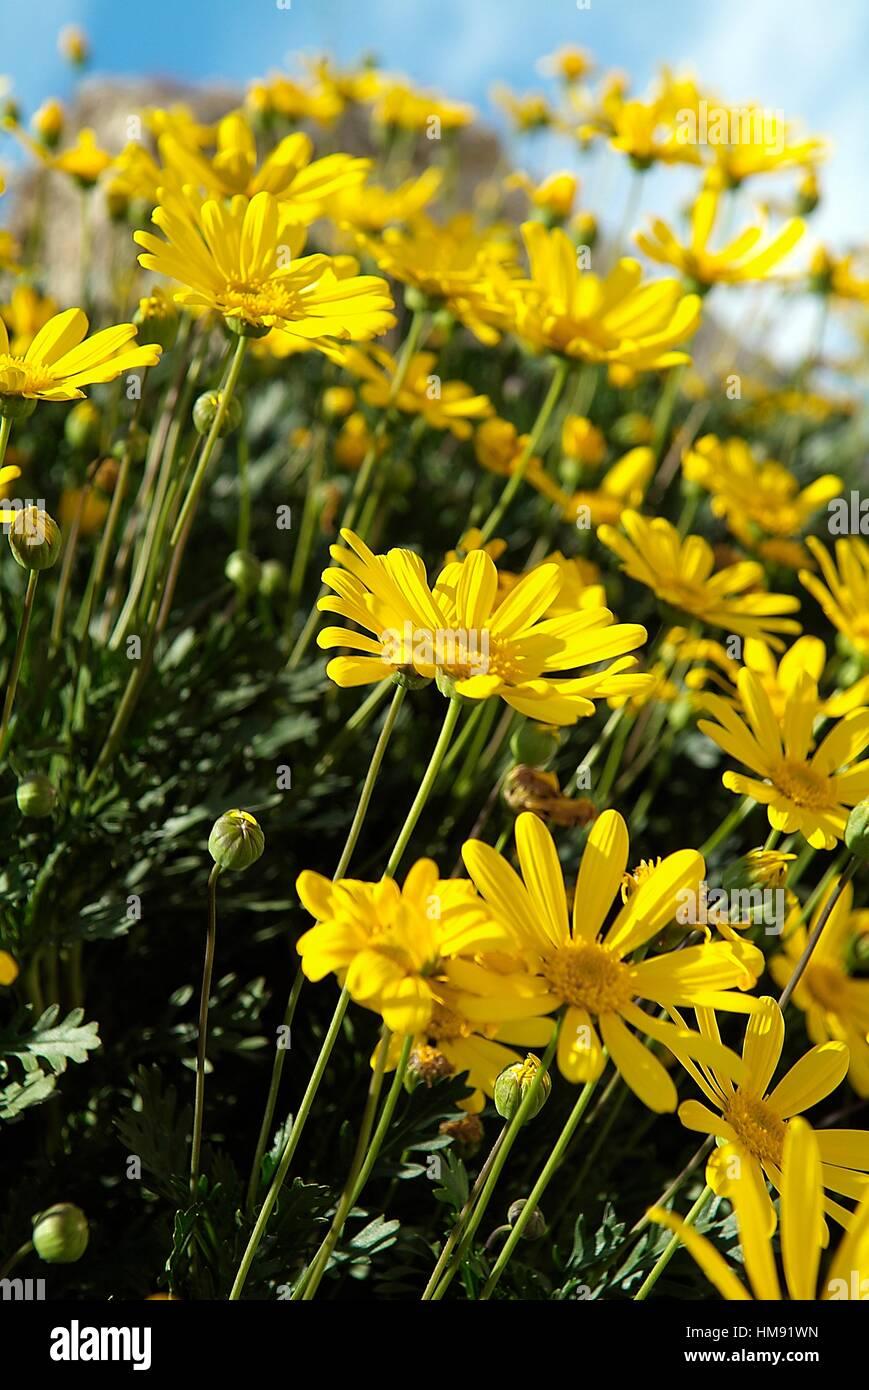 close up shot of yellow daisies field,location banyoles,girona,catalonia,spain,europe,. - Stock Image